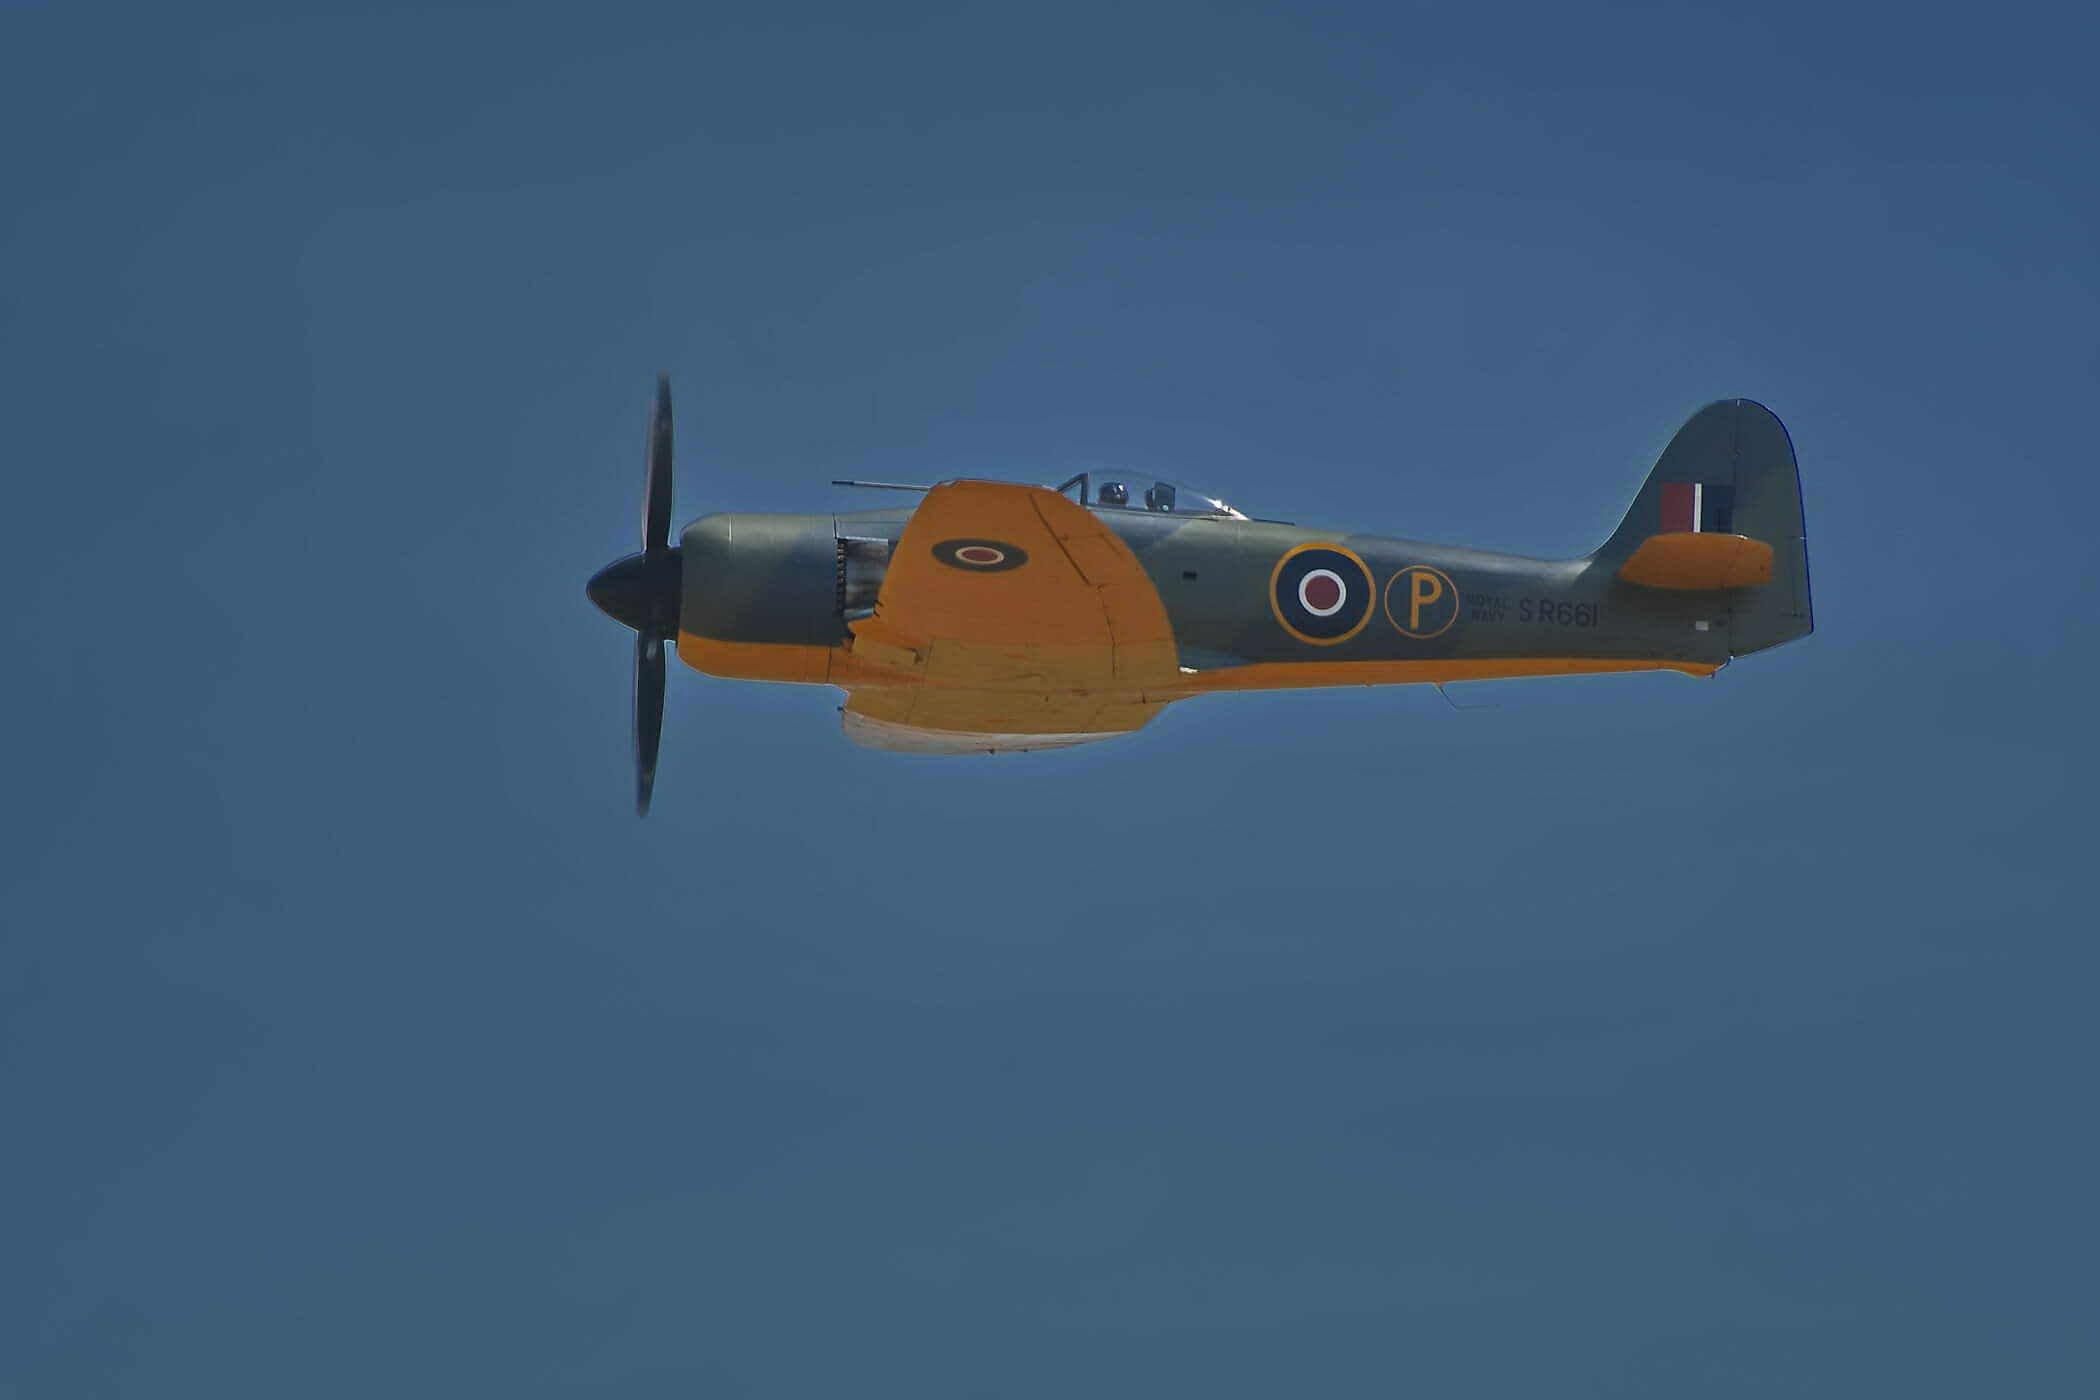 Hawker Sea Fury ISS 315